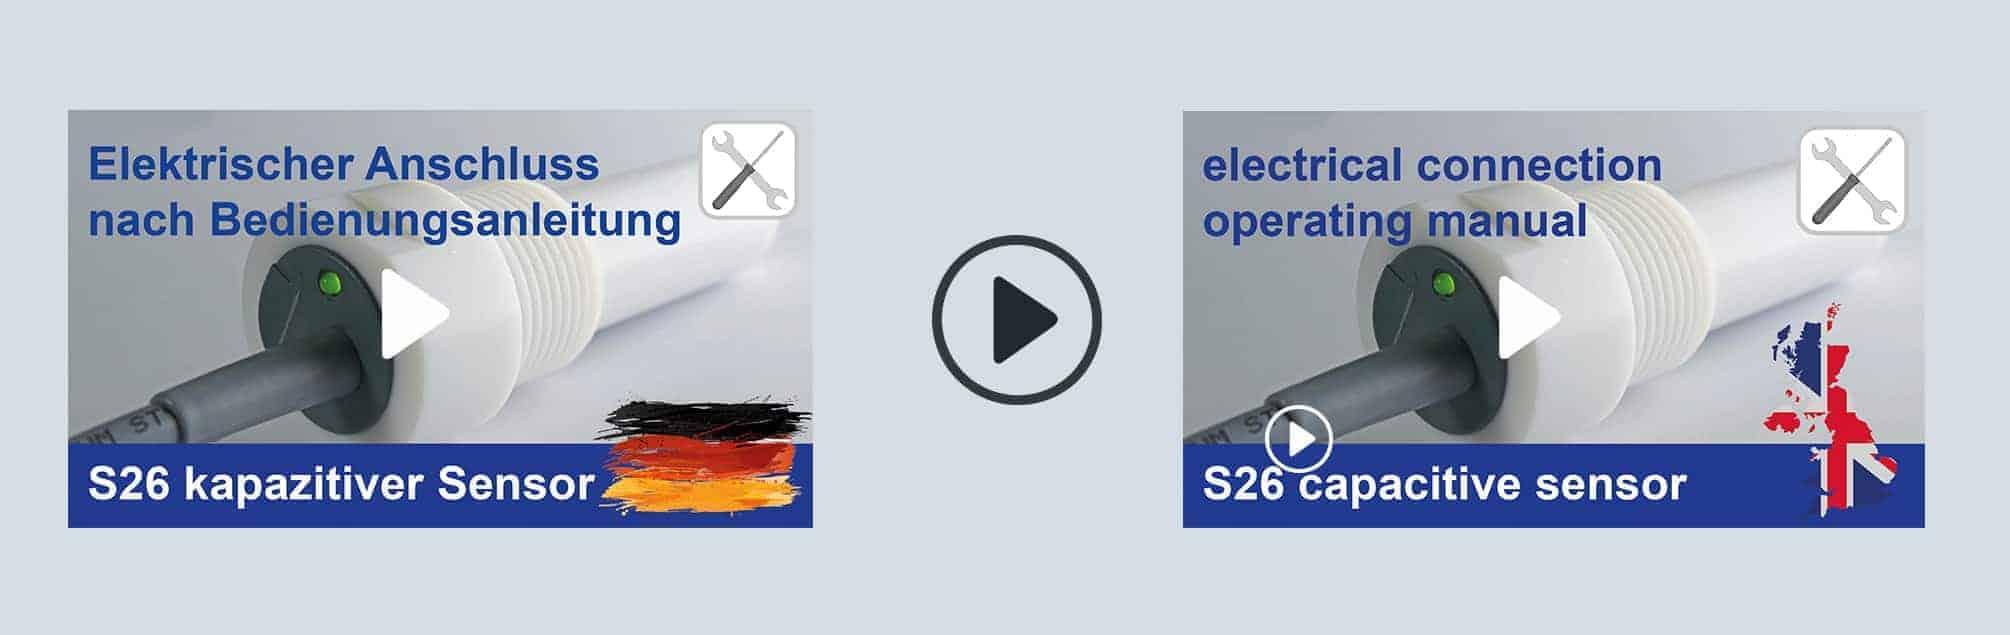 Slider Rechner Sensors Electrical Rough In Youtube Videos